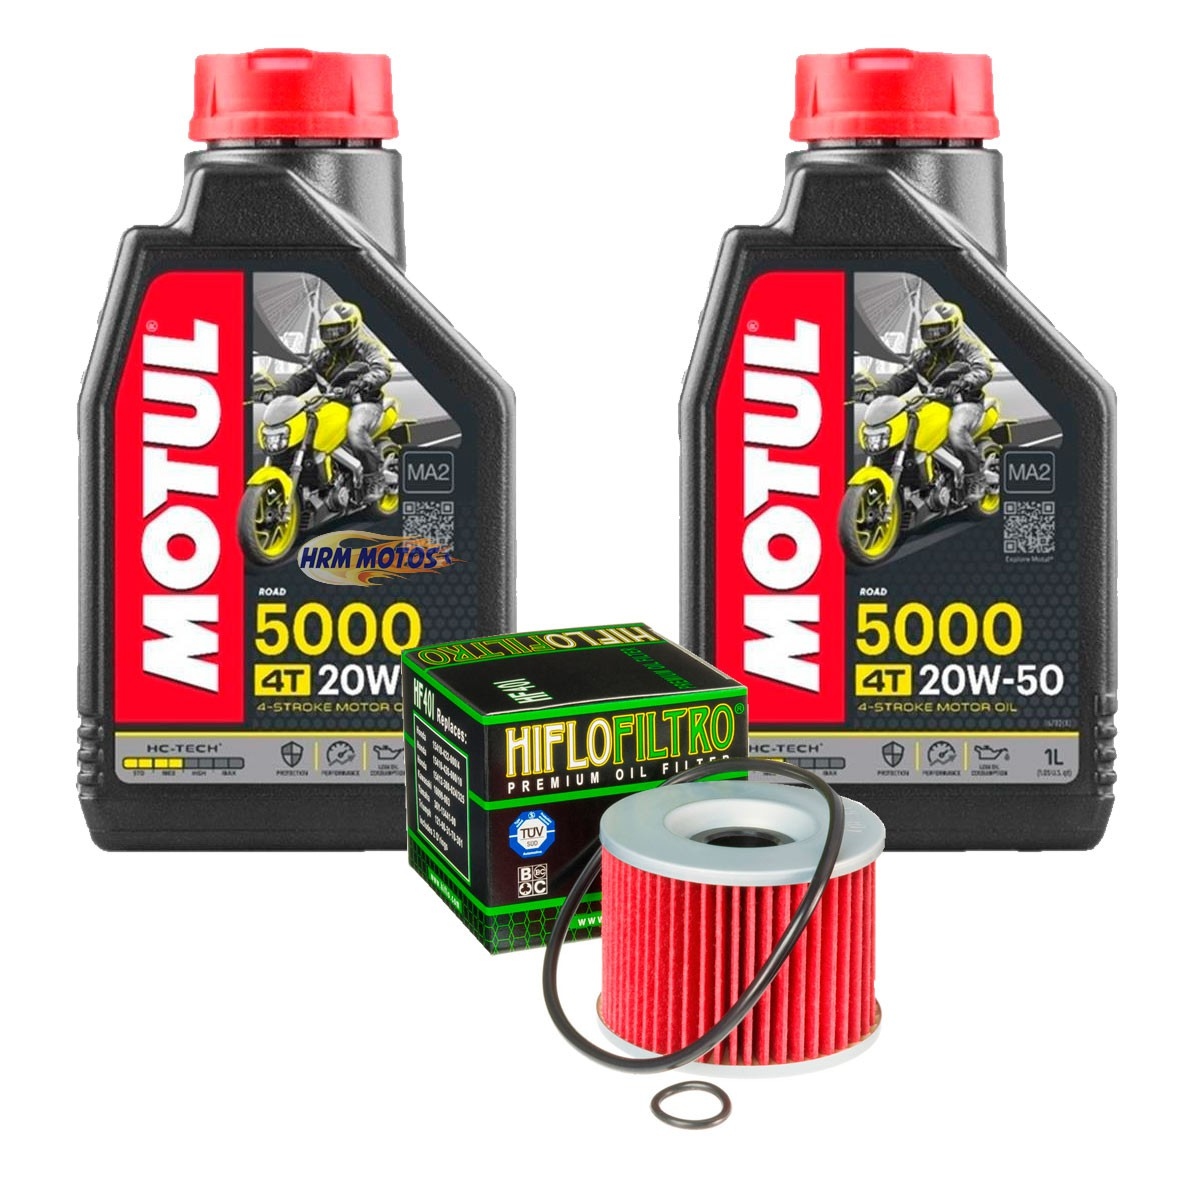 Kit Filtro de Óleo e 2 lts Motul 5000 20w50 Para Ninja 250R c/Anel Vedação